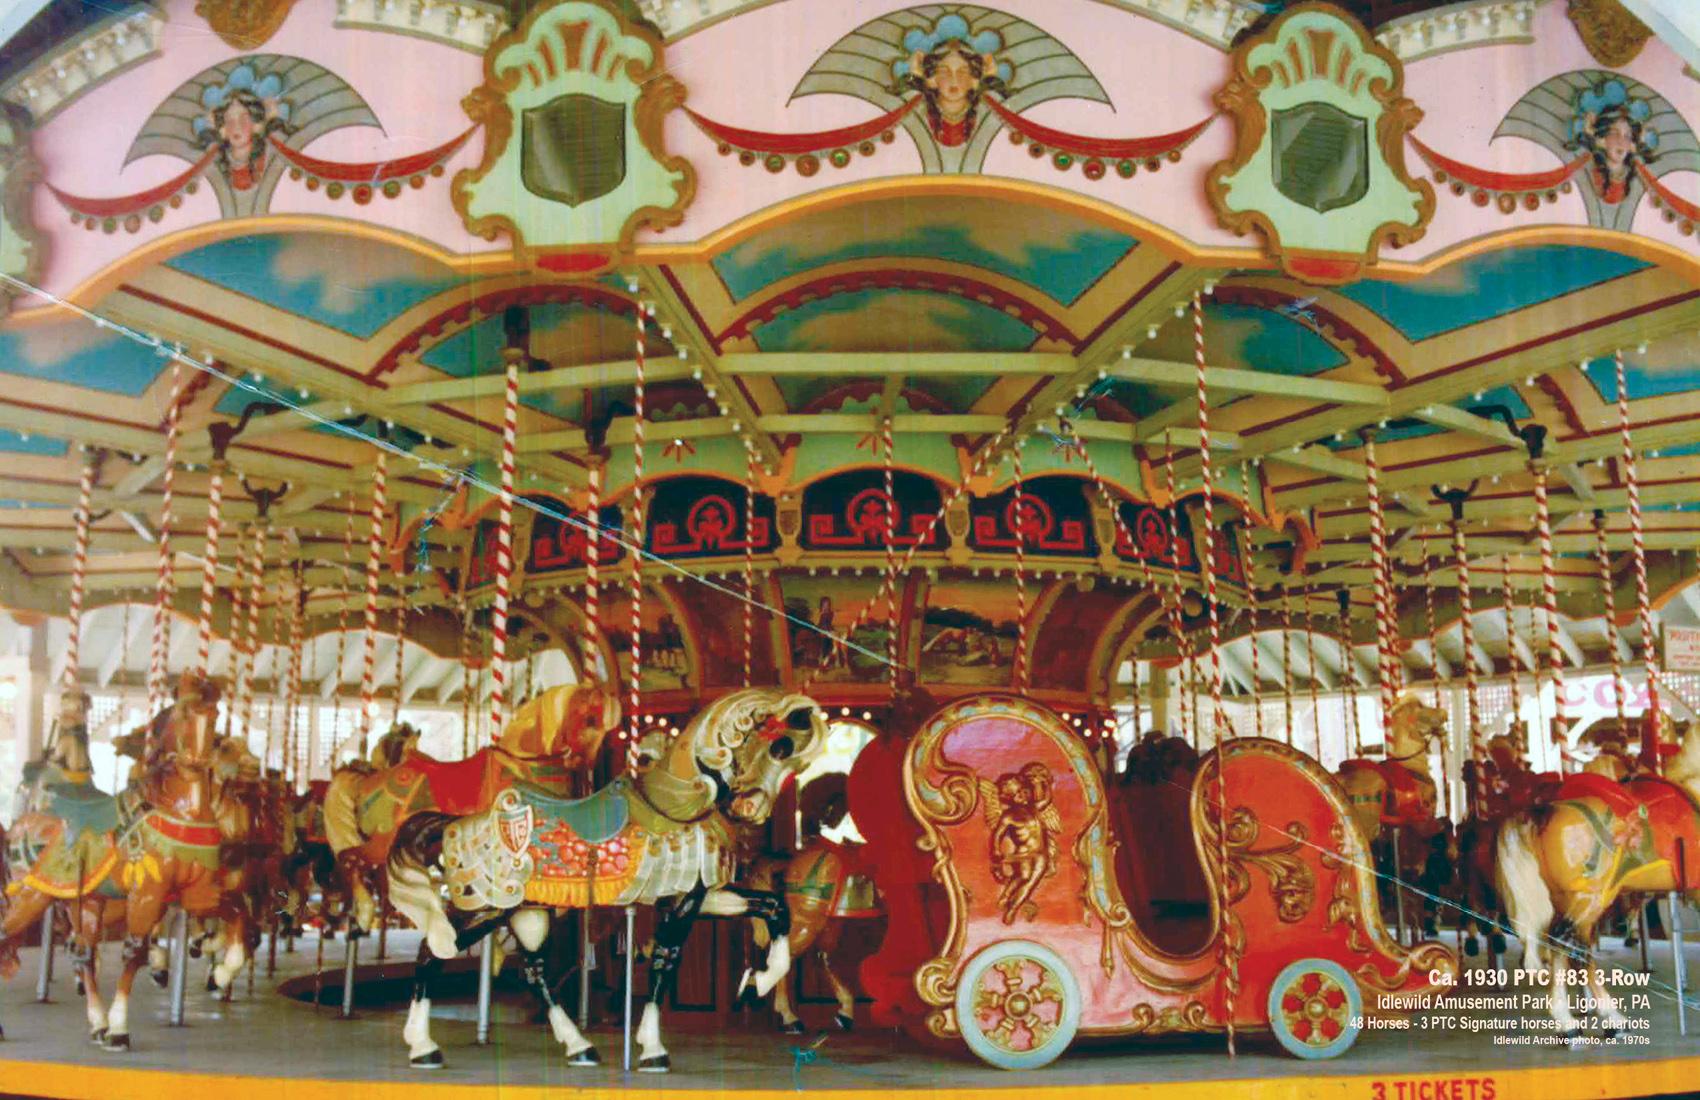 1930-PTC-83-carousel-Idlewild-Park-PA-CNT-center-Jan-13